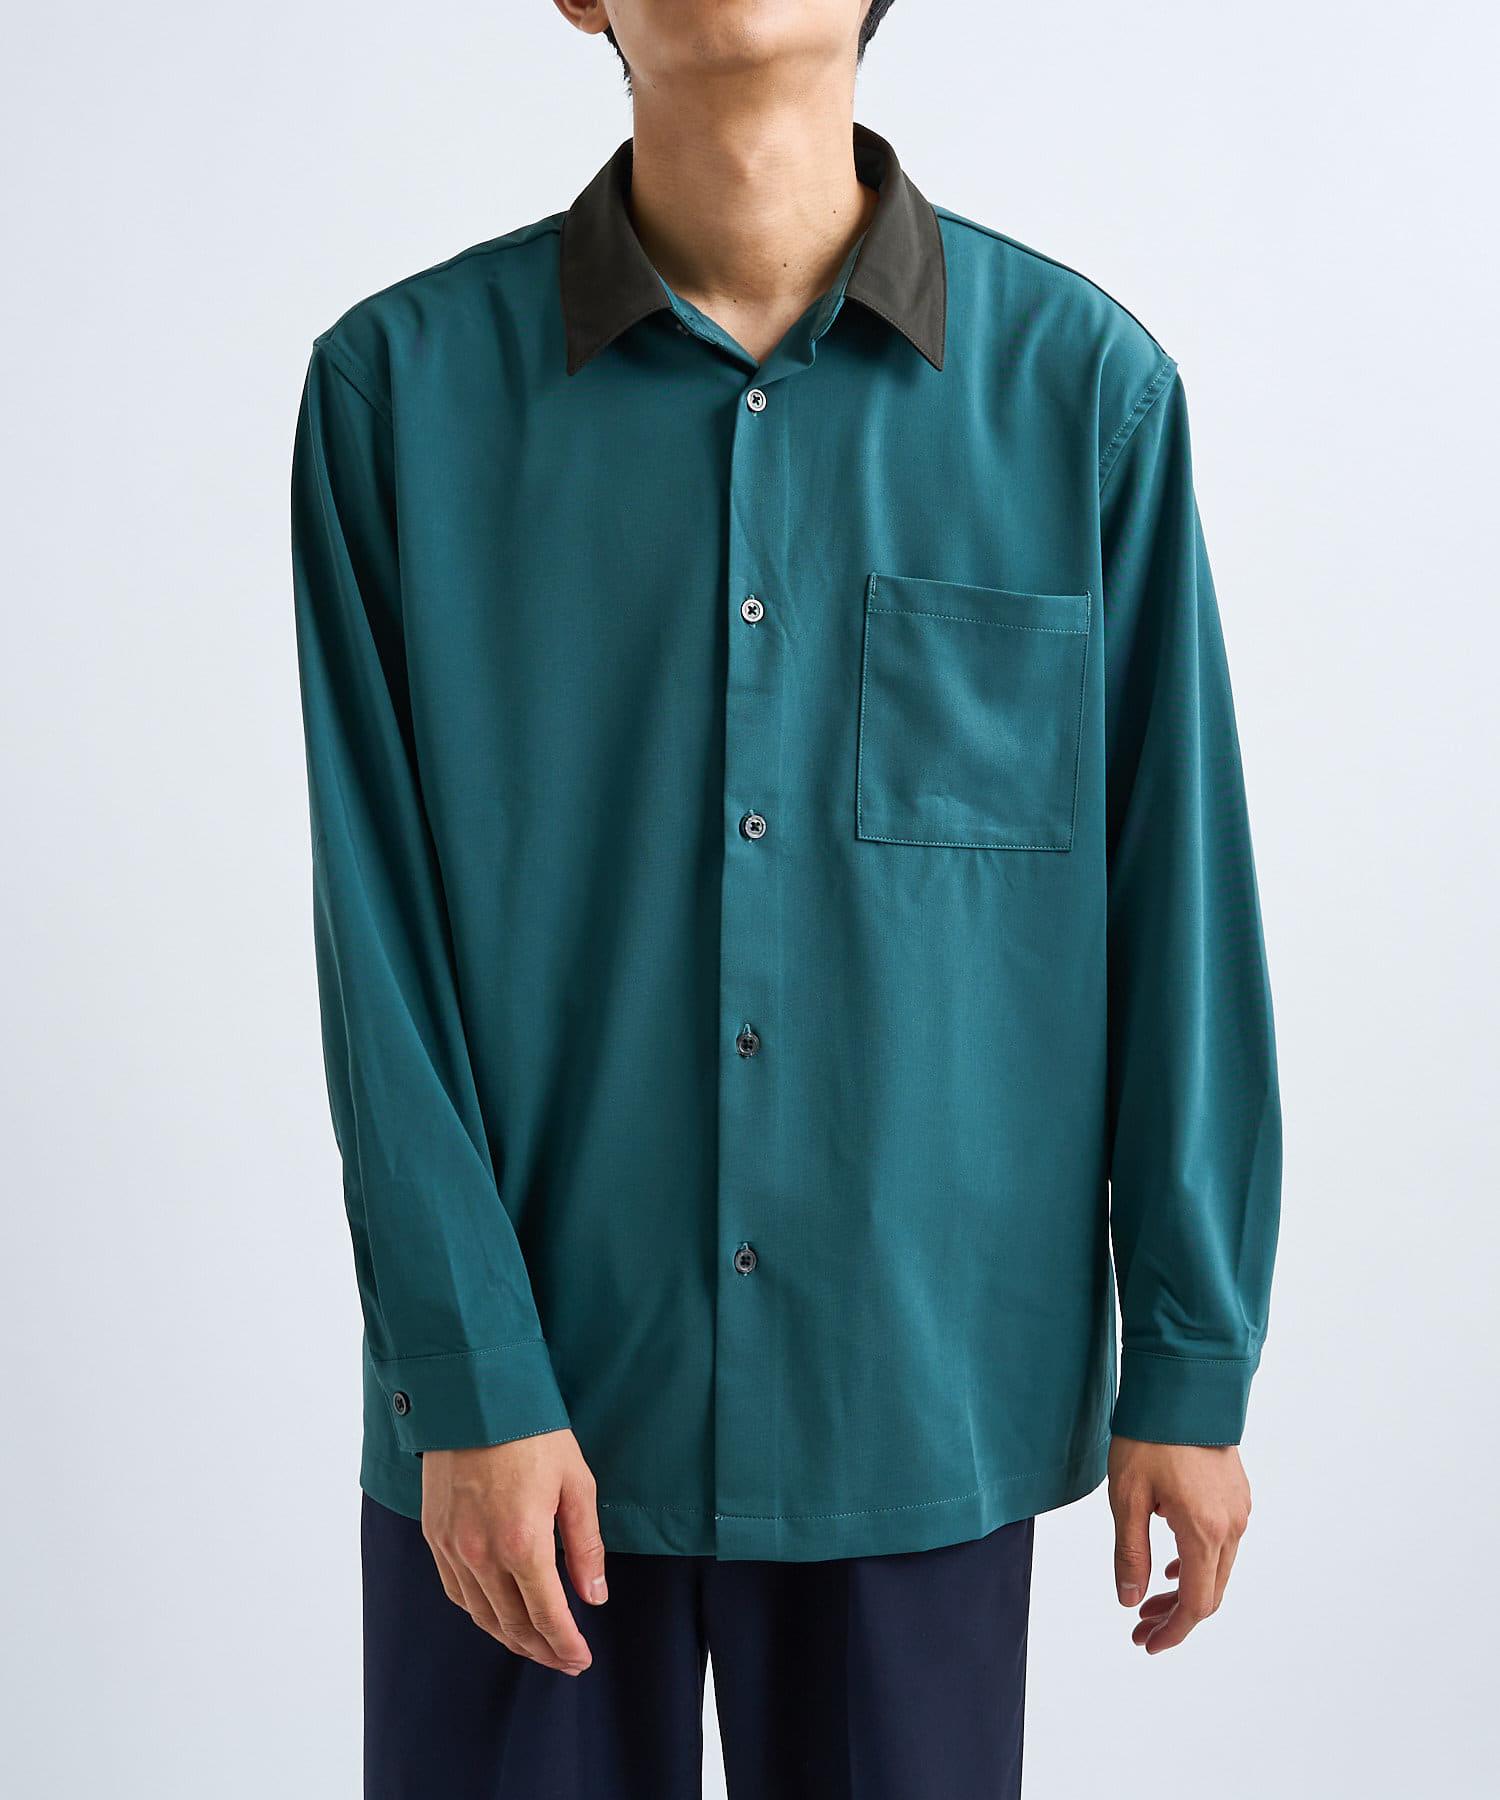 CIAOPANIC(チャオパニック) 襟切り替えデザインドレープシャツ